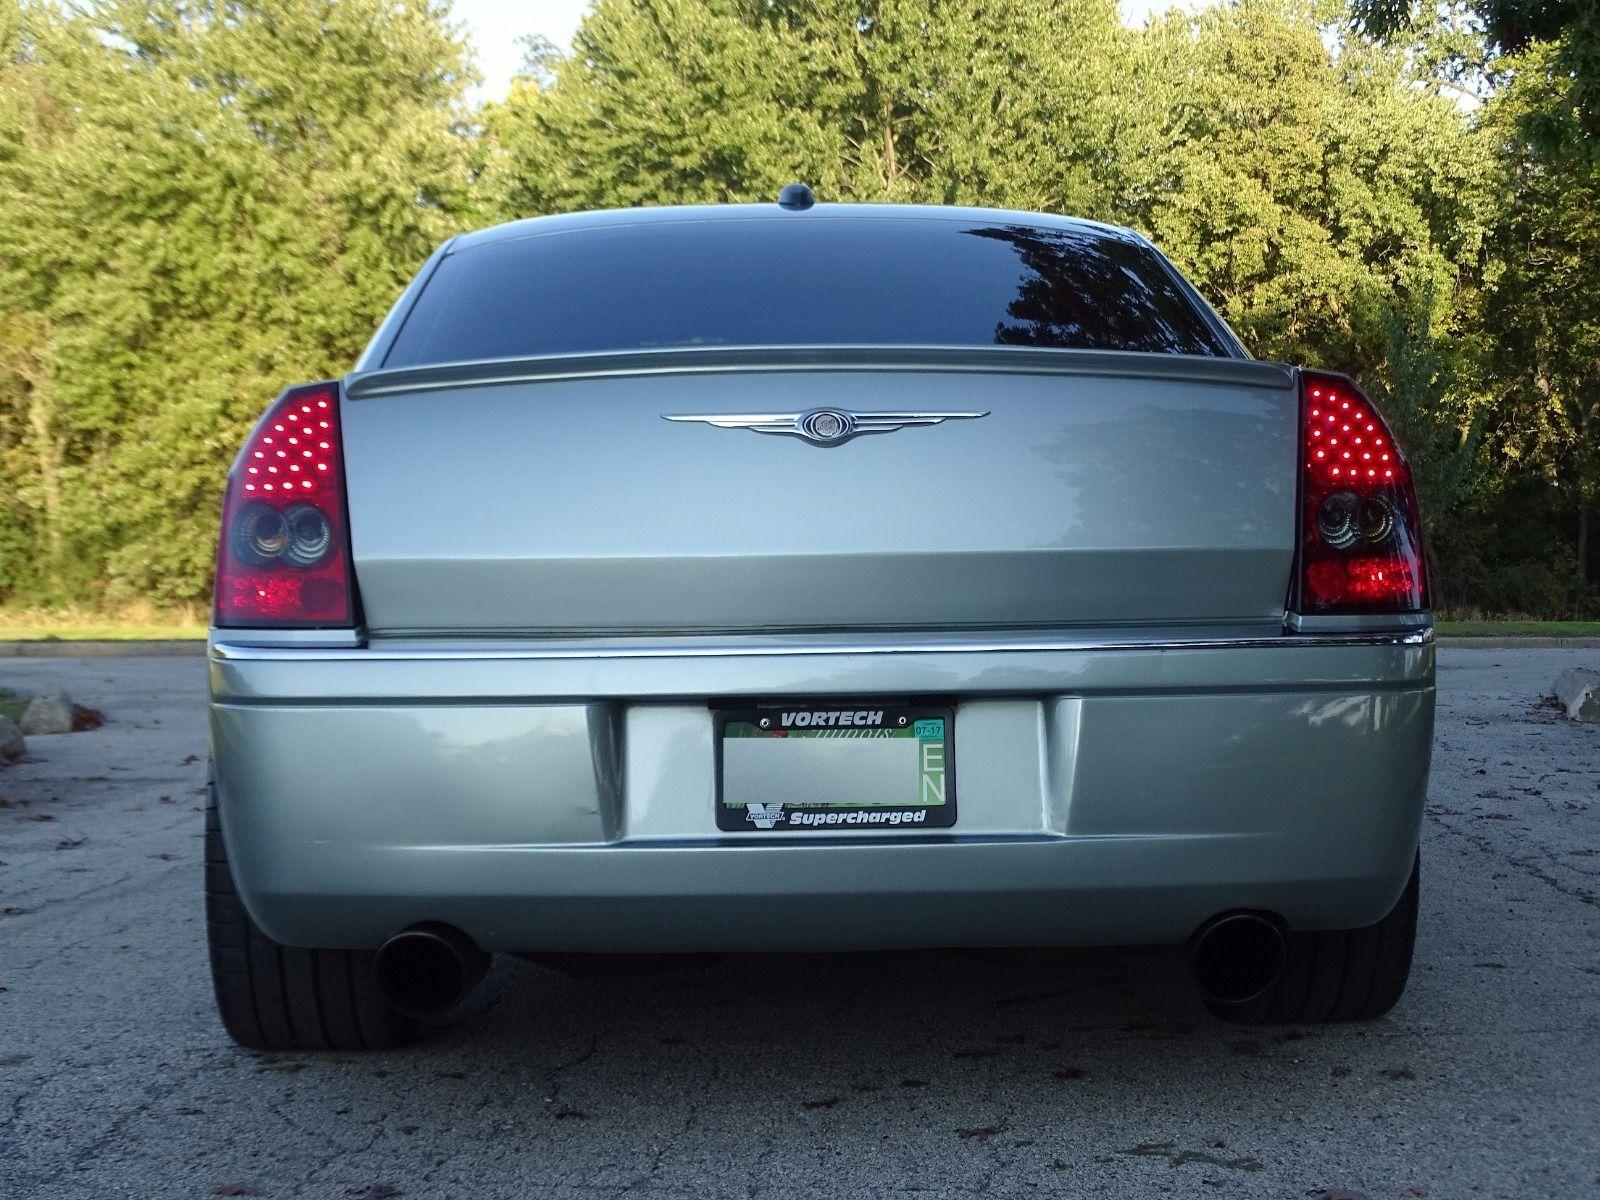 2005 Chrysler 300c 400ci w/ Vortech